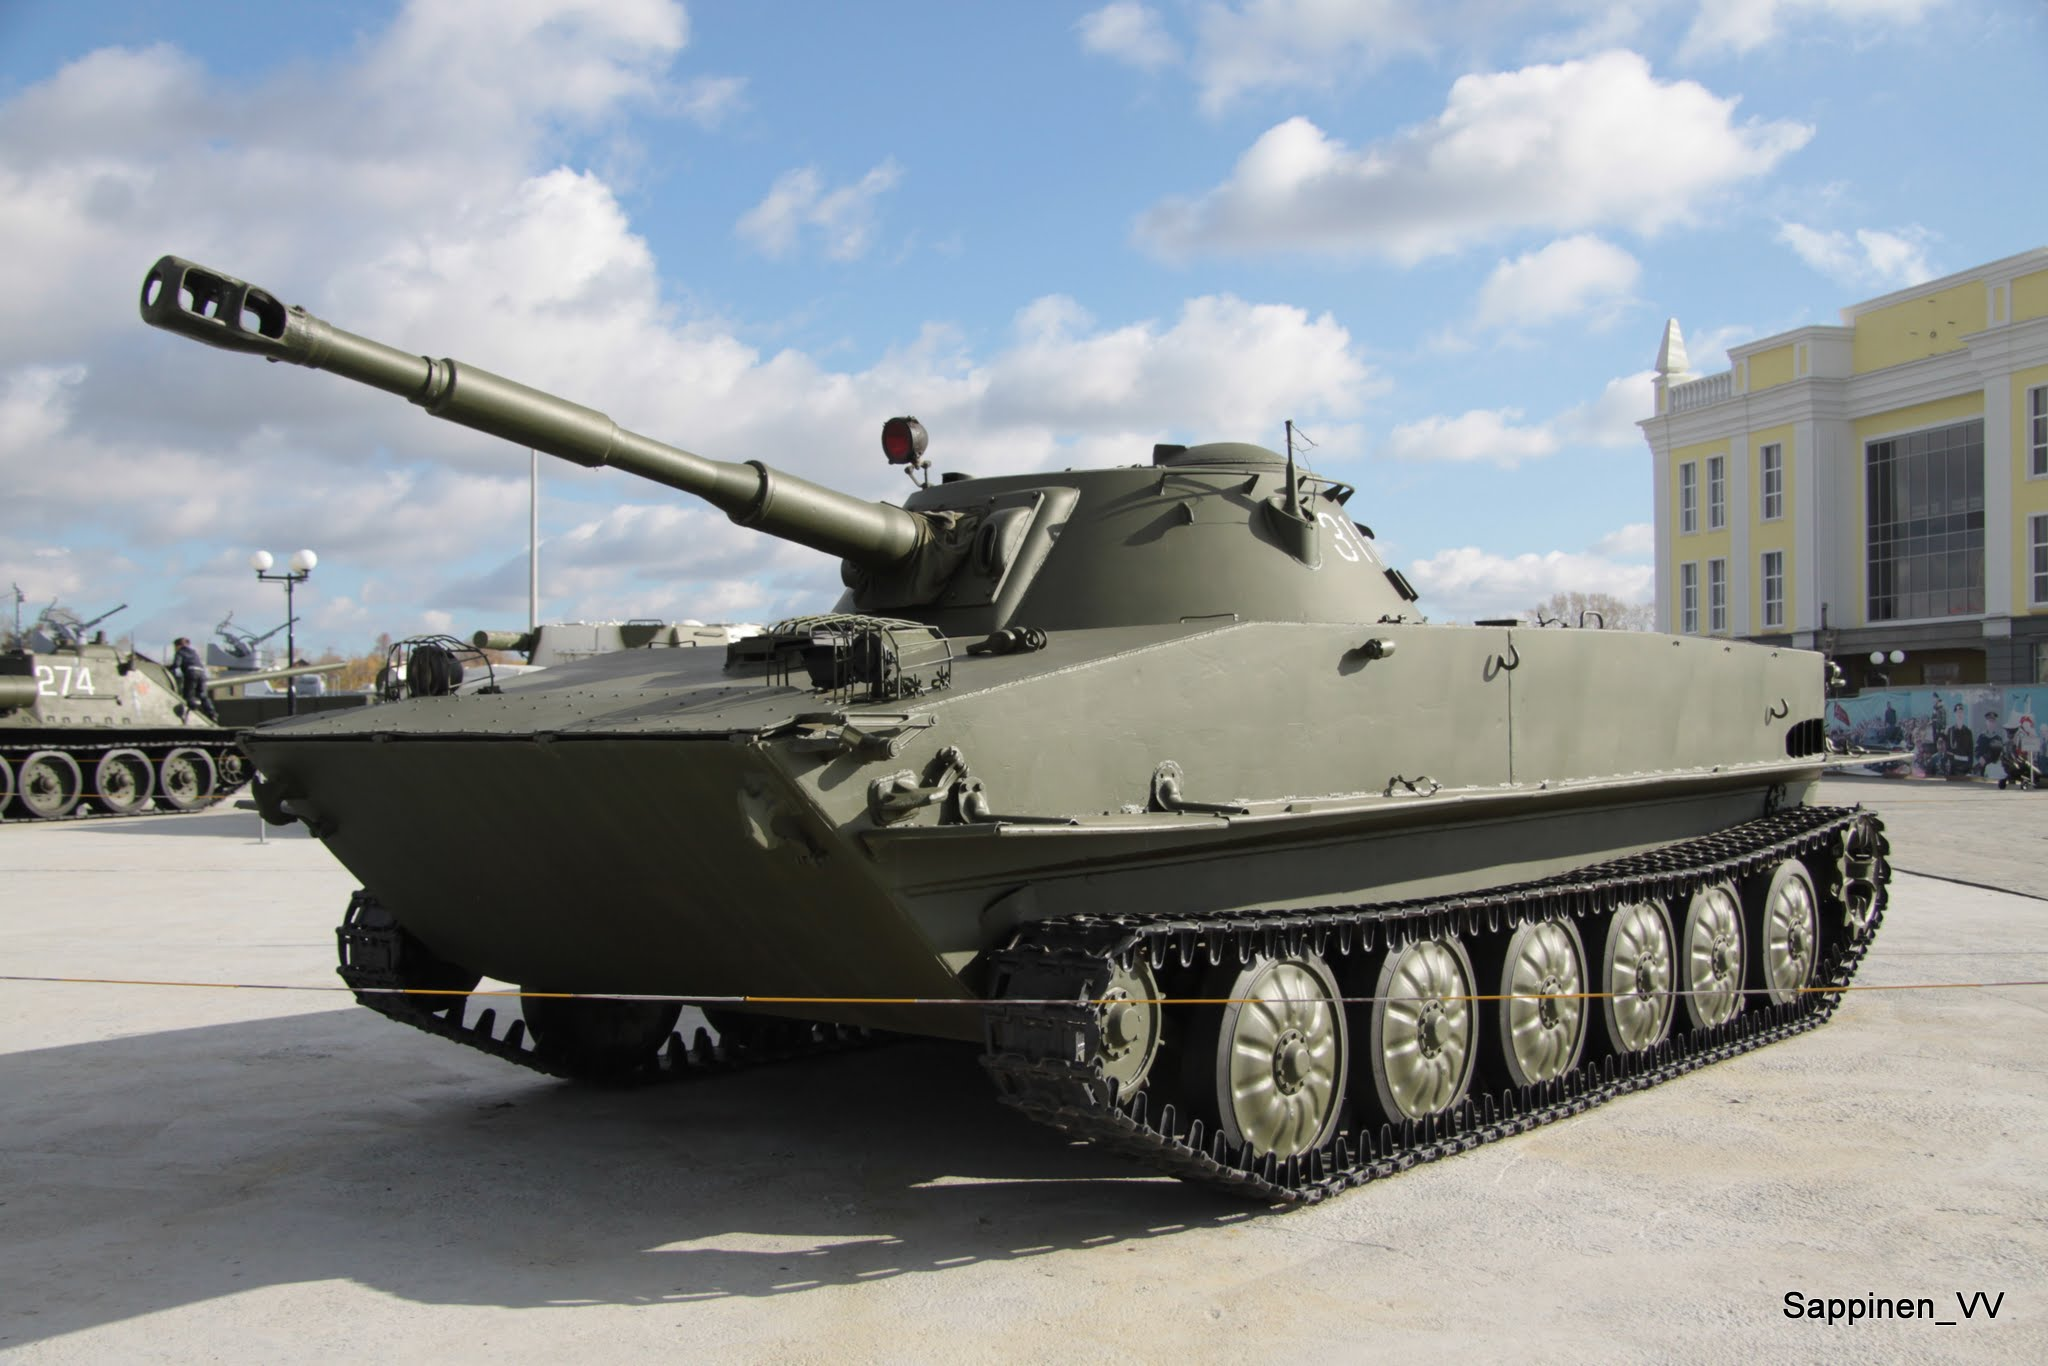 PT-76 - Wikipedia